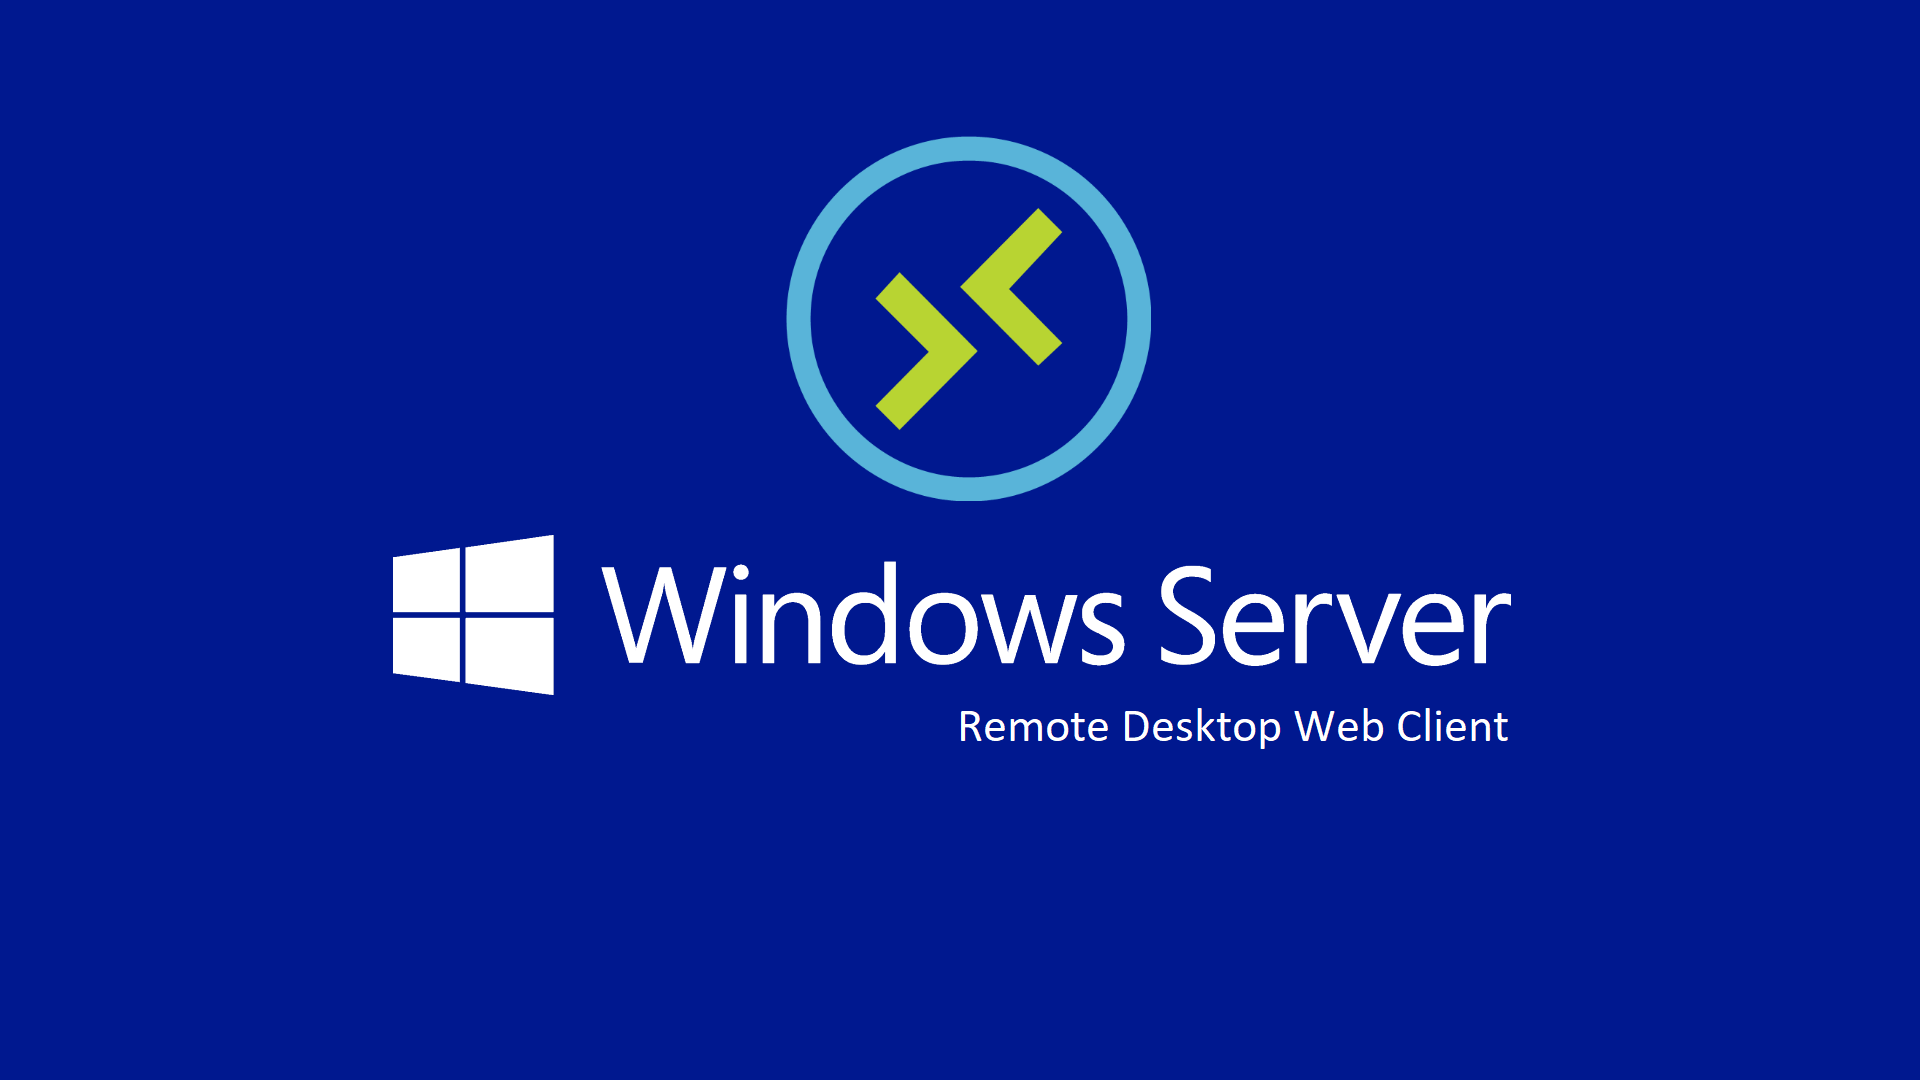 Remote Desktop Web Client in Windows Server 2016 e Windows Server